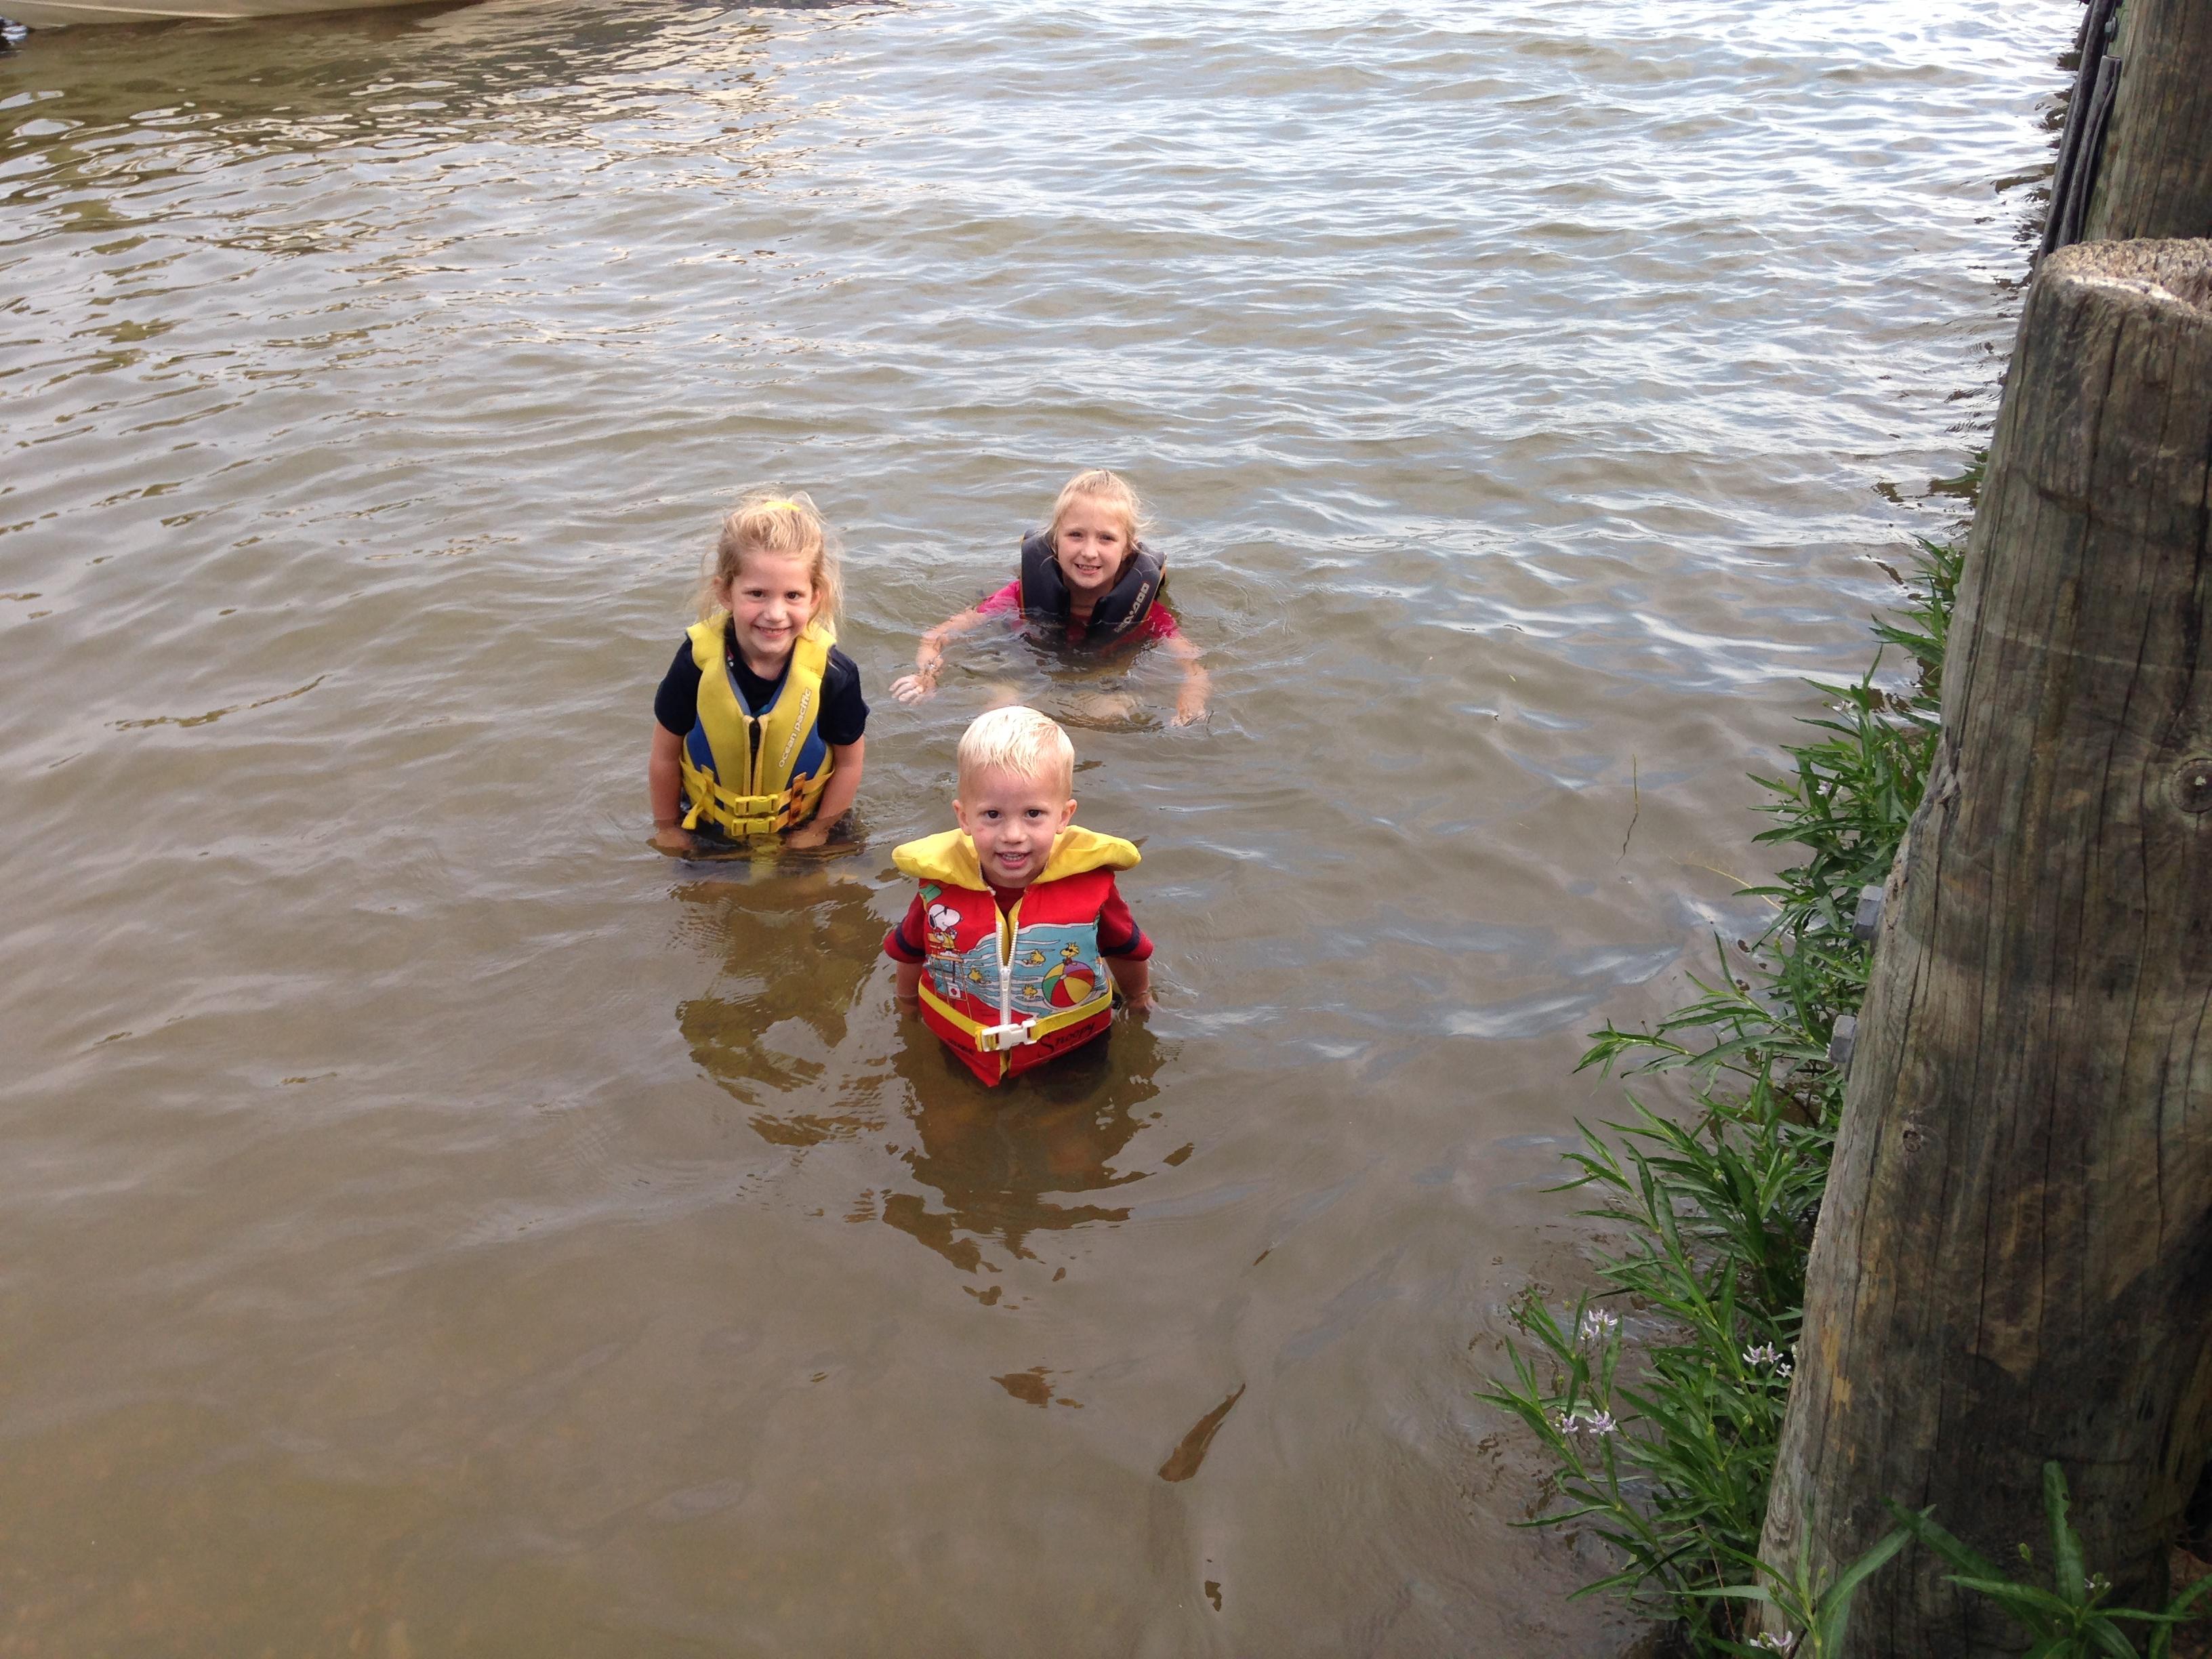 Swimming on the boat ramp. (Tara, Kaylin & Kolby)